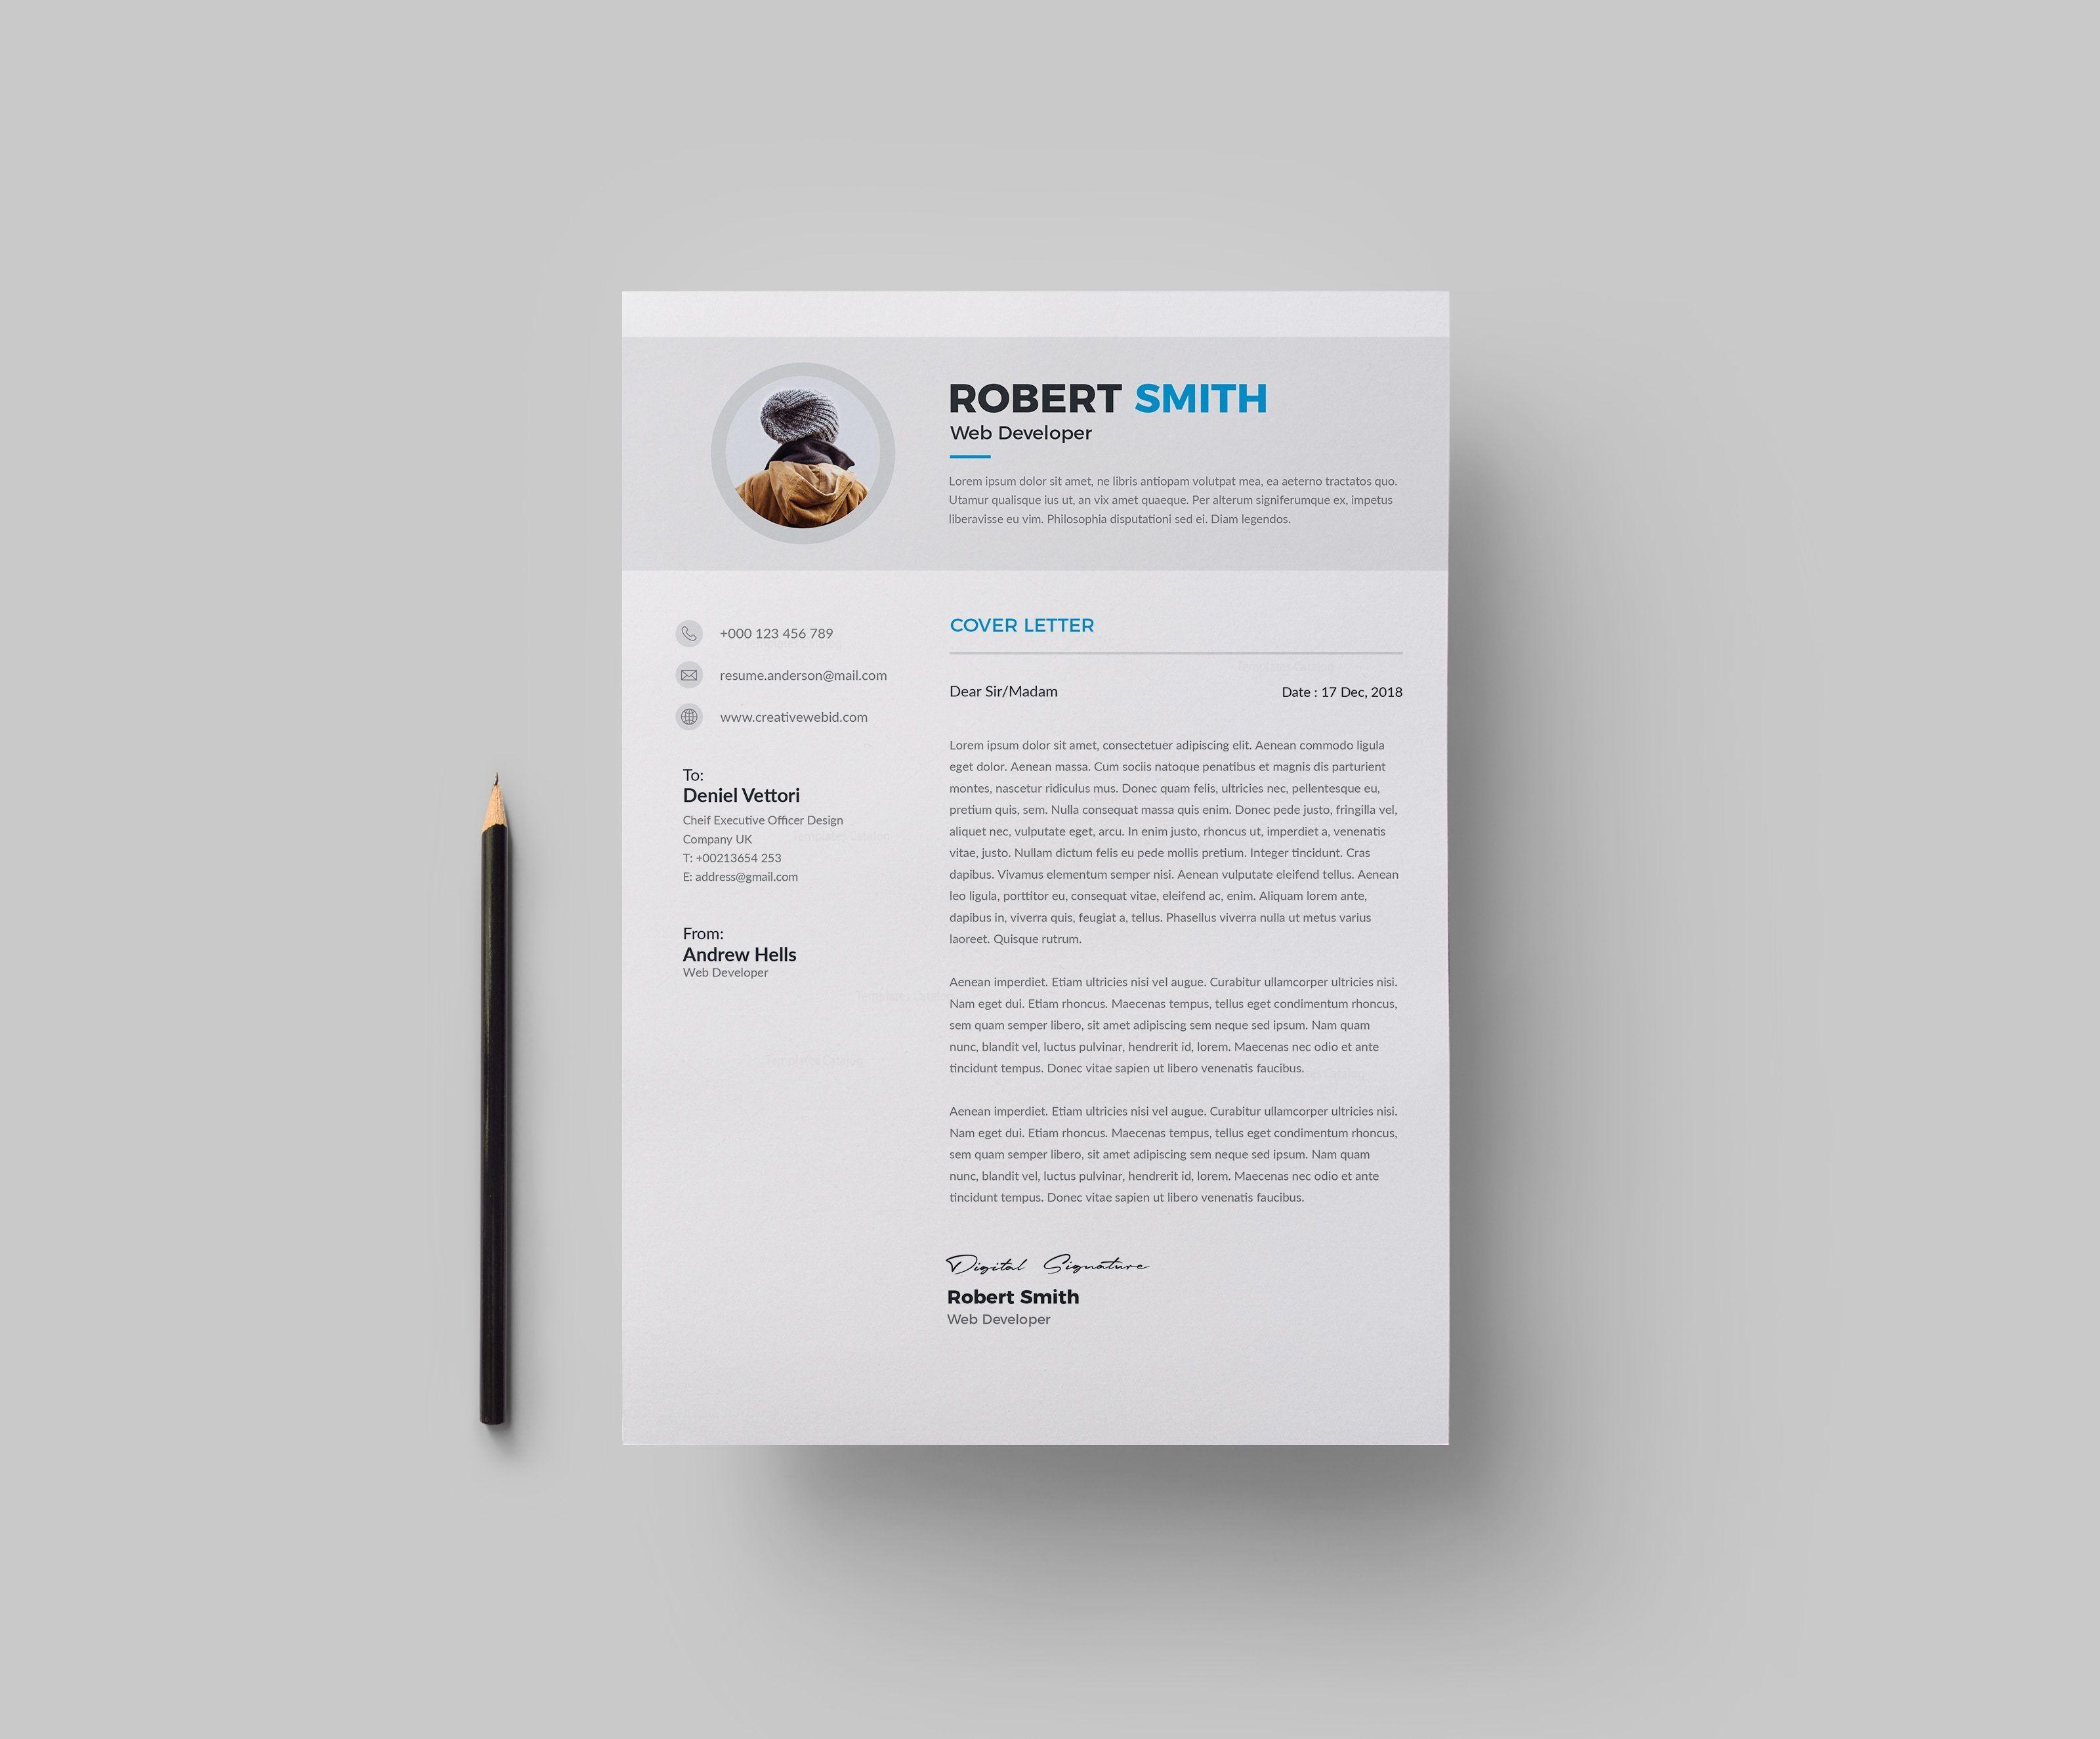 Austin Professional Resume Design Template Graphic Templates Resume Design Template Resume Design Resume Design Professional